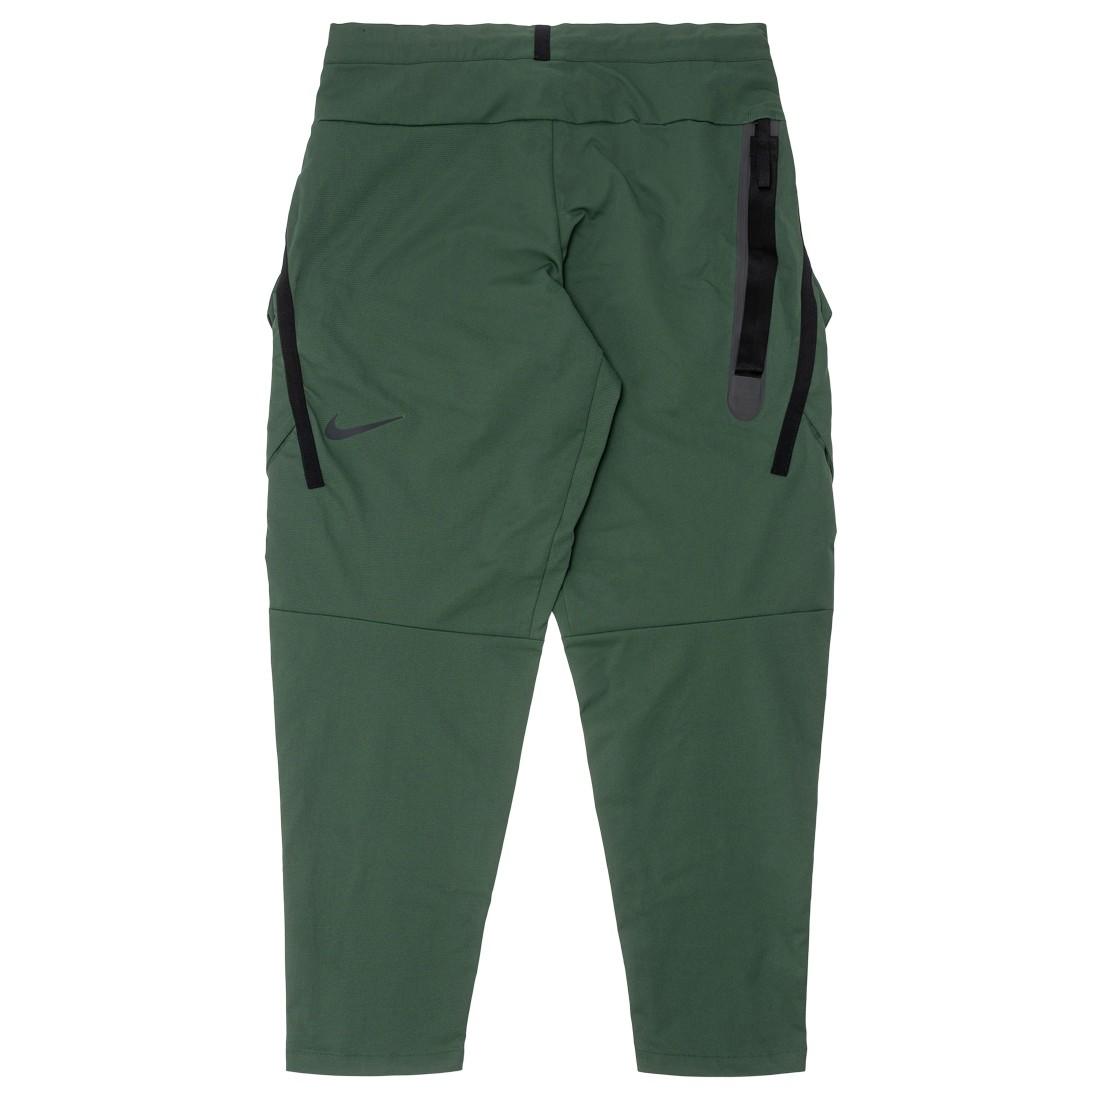 Nike Men Sportswear Tech Pack Pants (galactic jade / black / black)